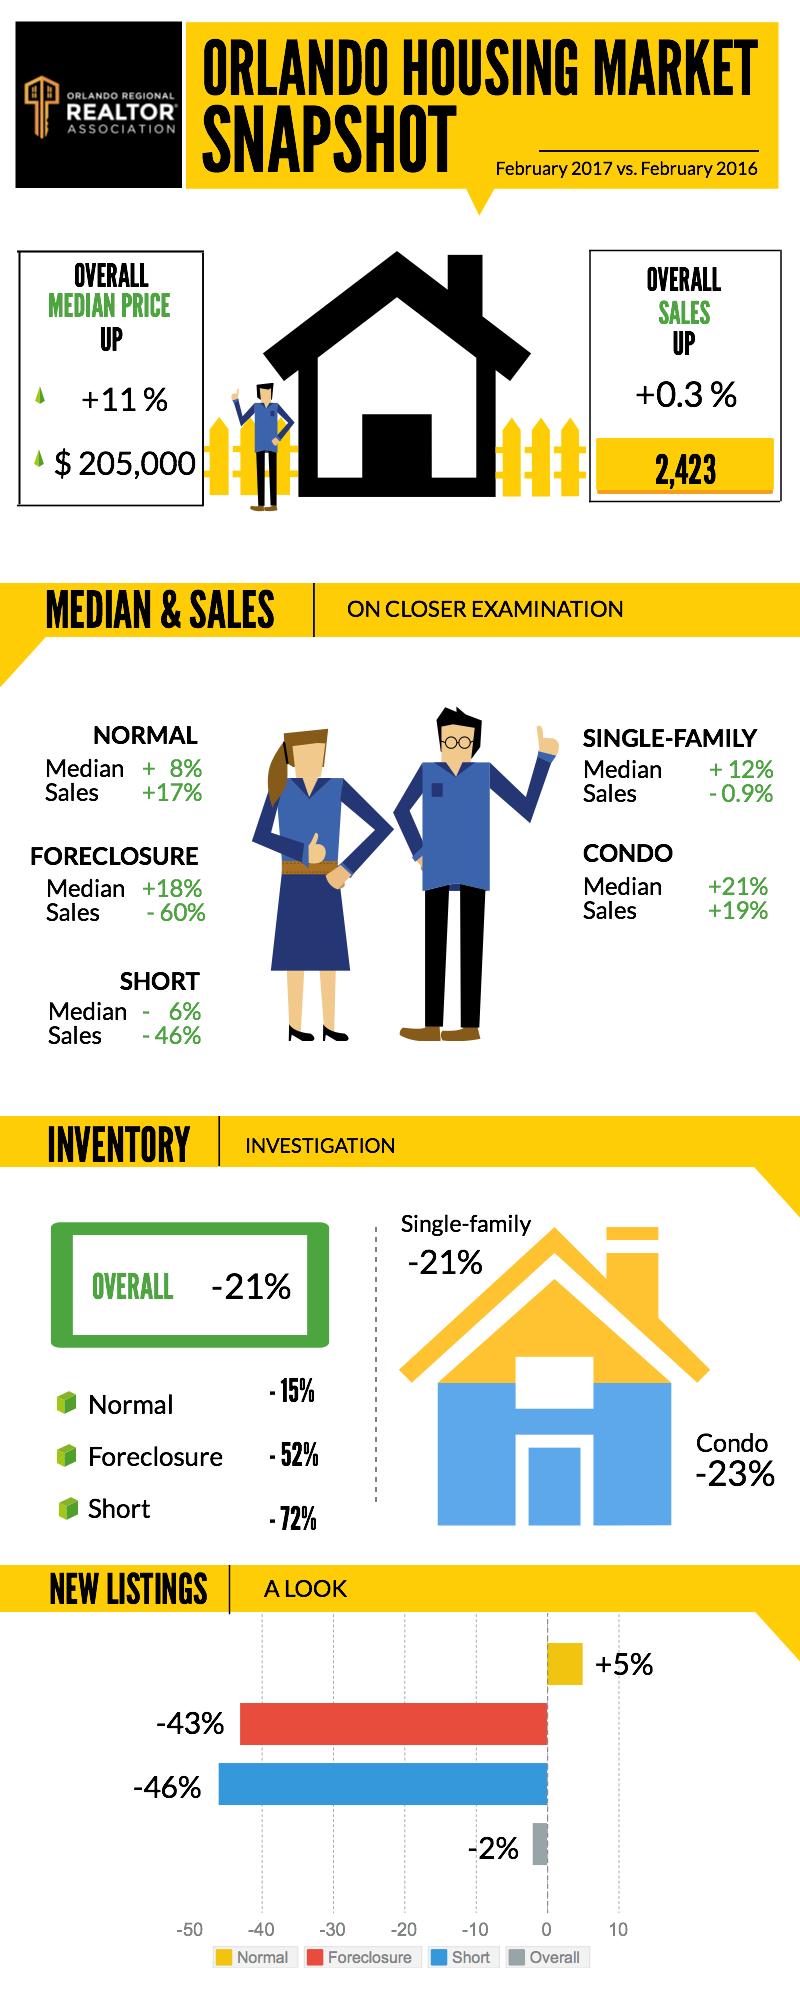 ORRA's 2017 Orlando housing market snapshot infographic